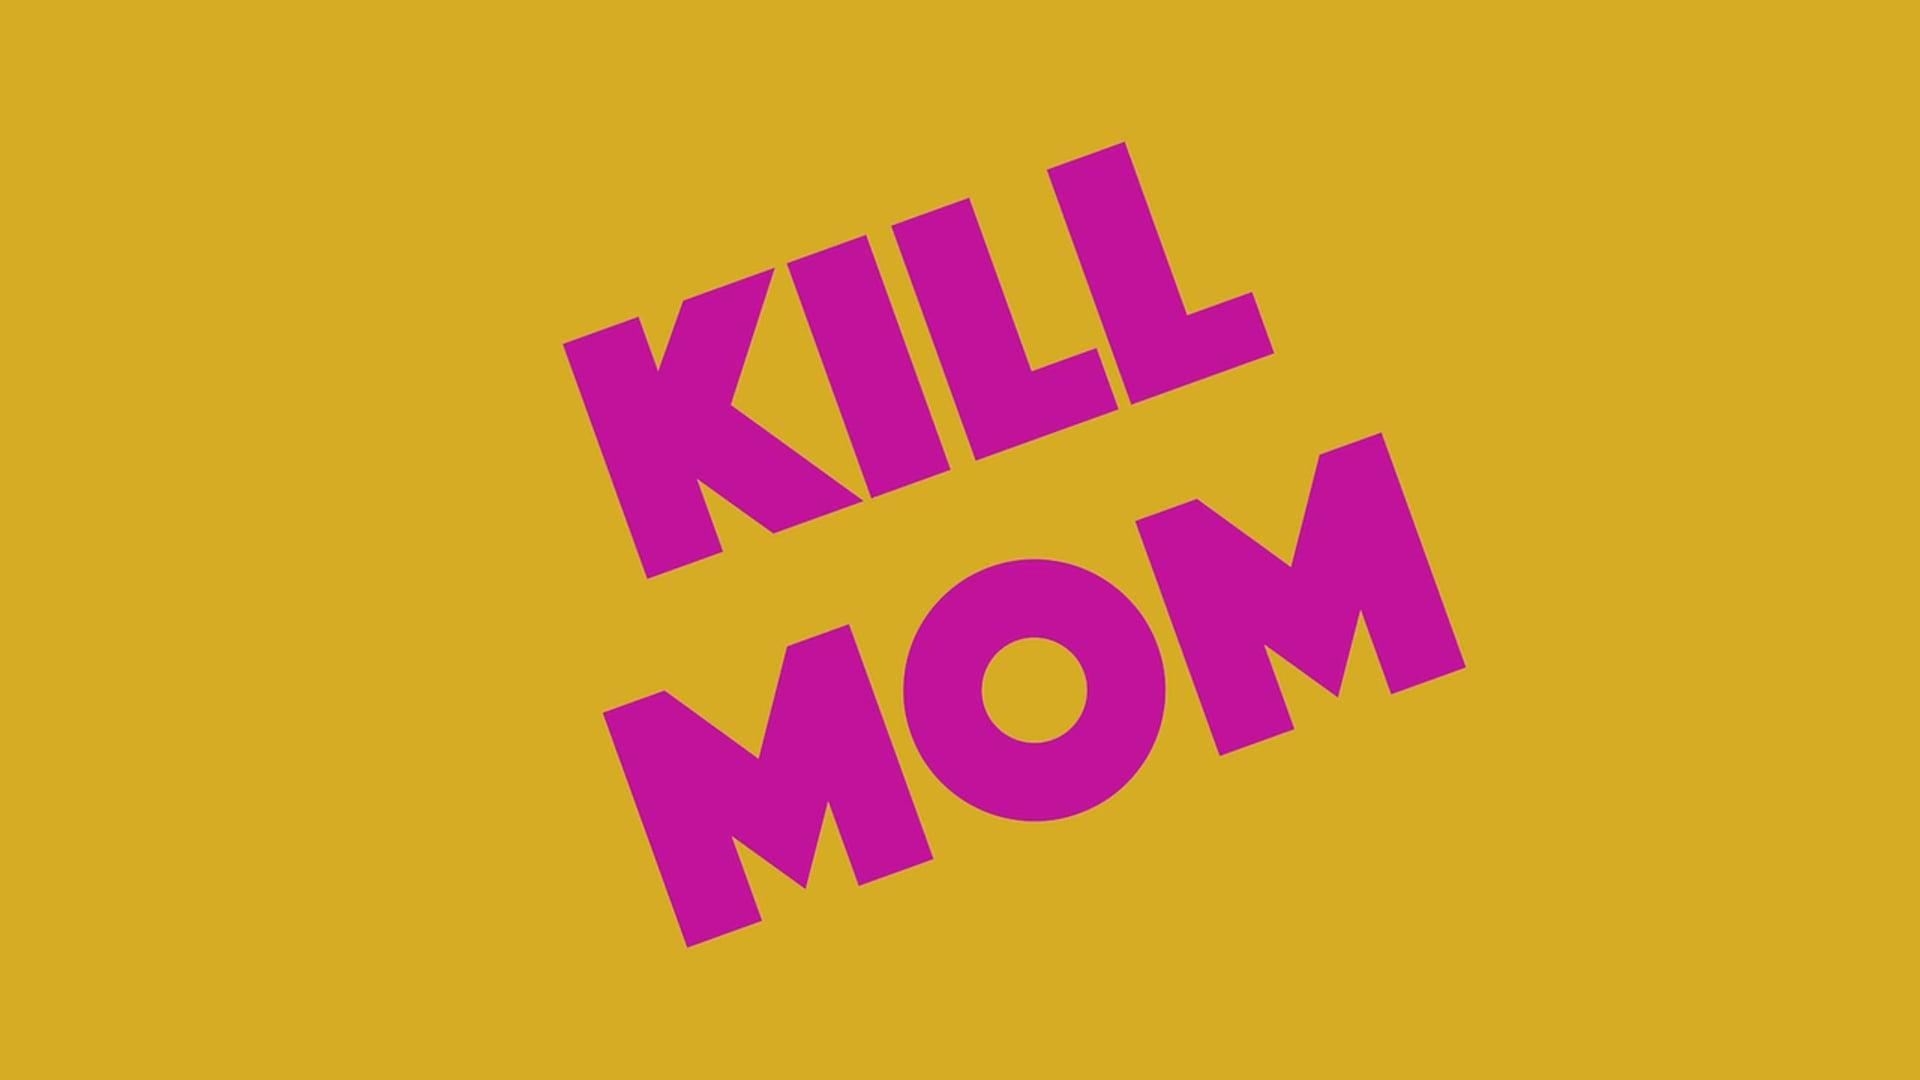 Kill Mom